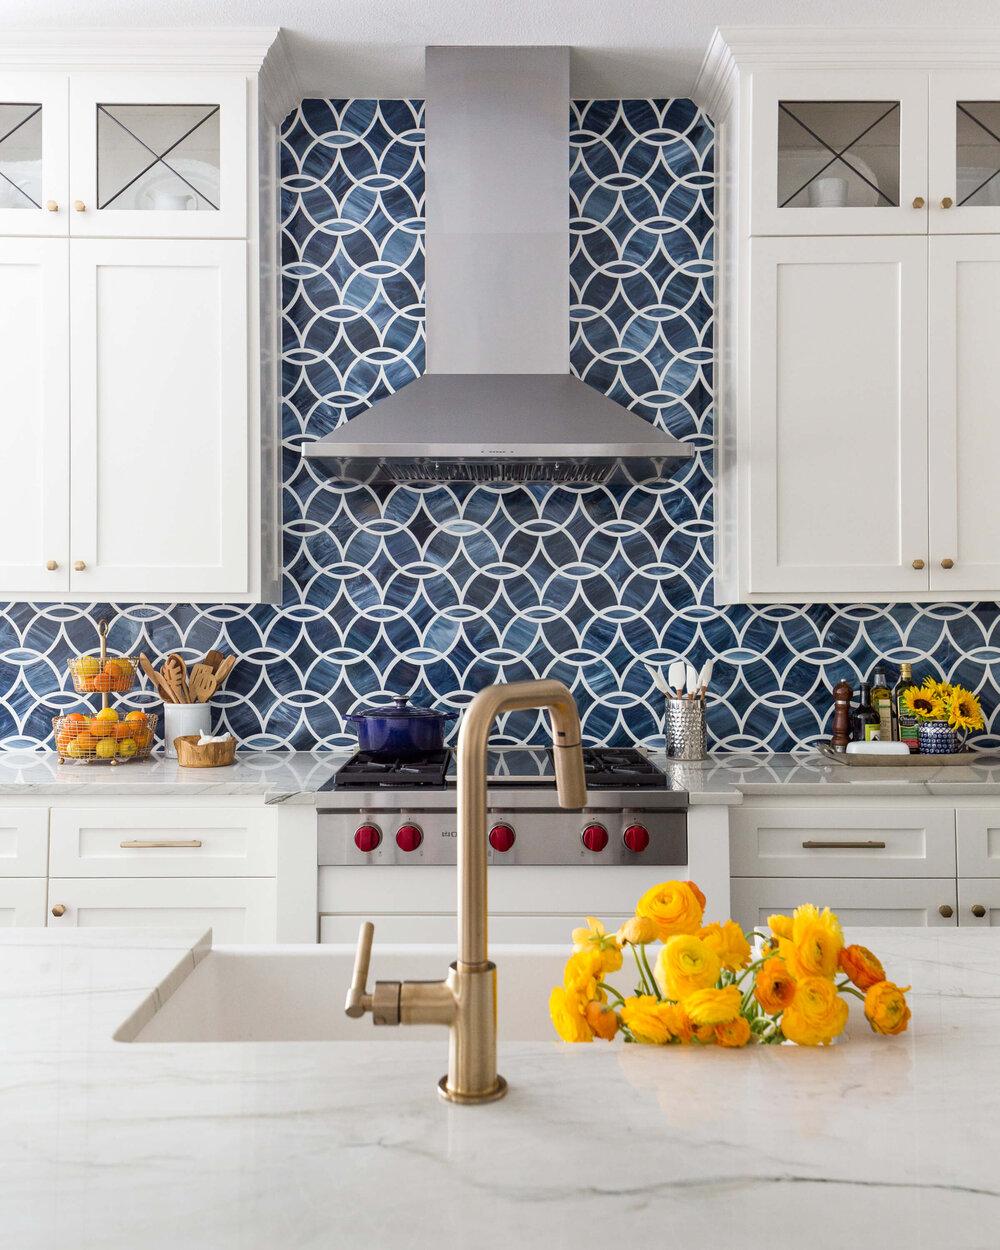 A bold blue mosaic tile backsplash makes a big statement in this white kitchen. Designer, Carla Aston | Photographer: Colleen Scott #whitekitchen